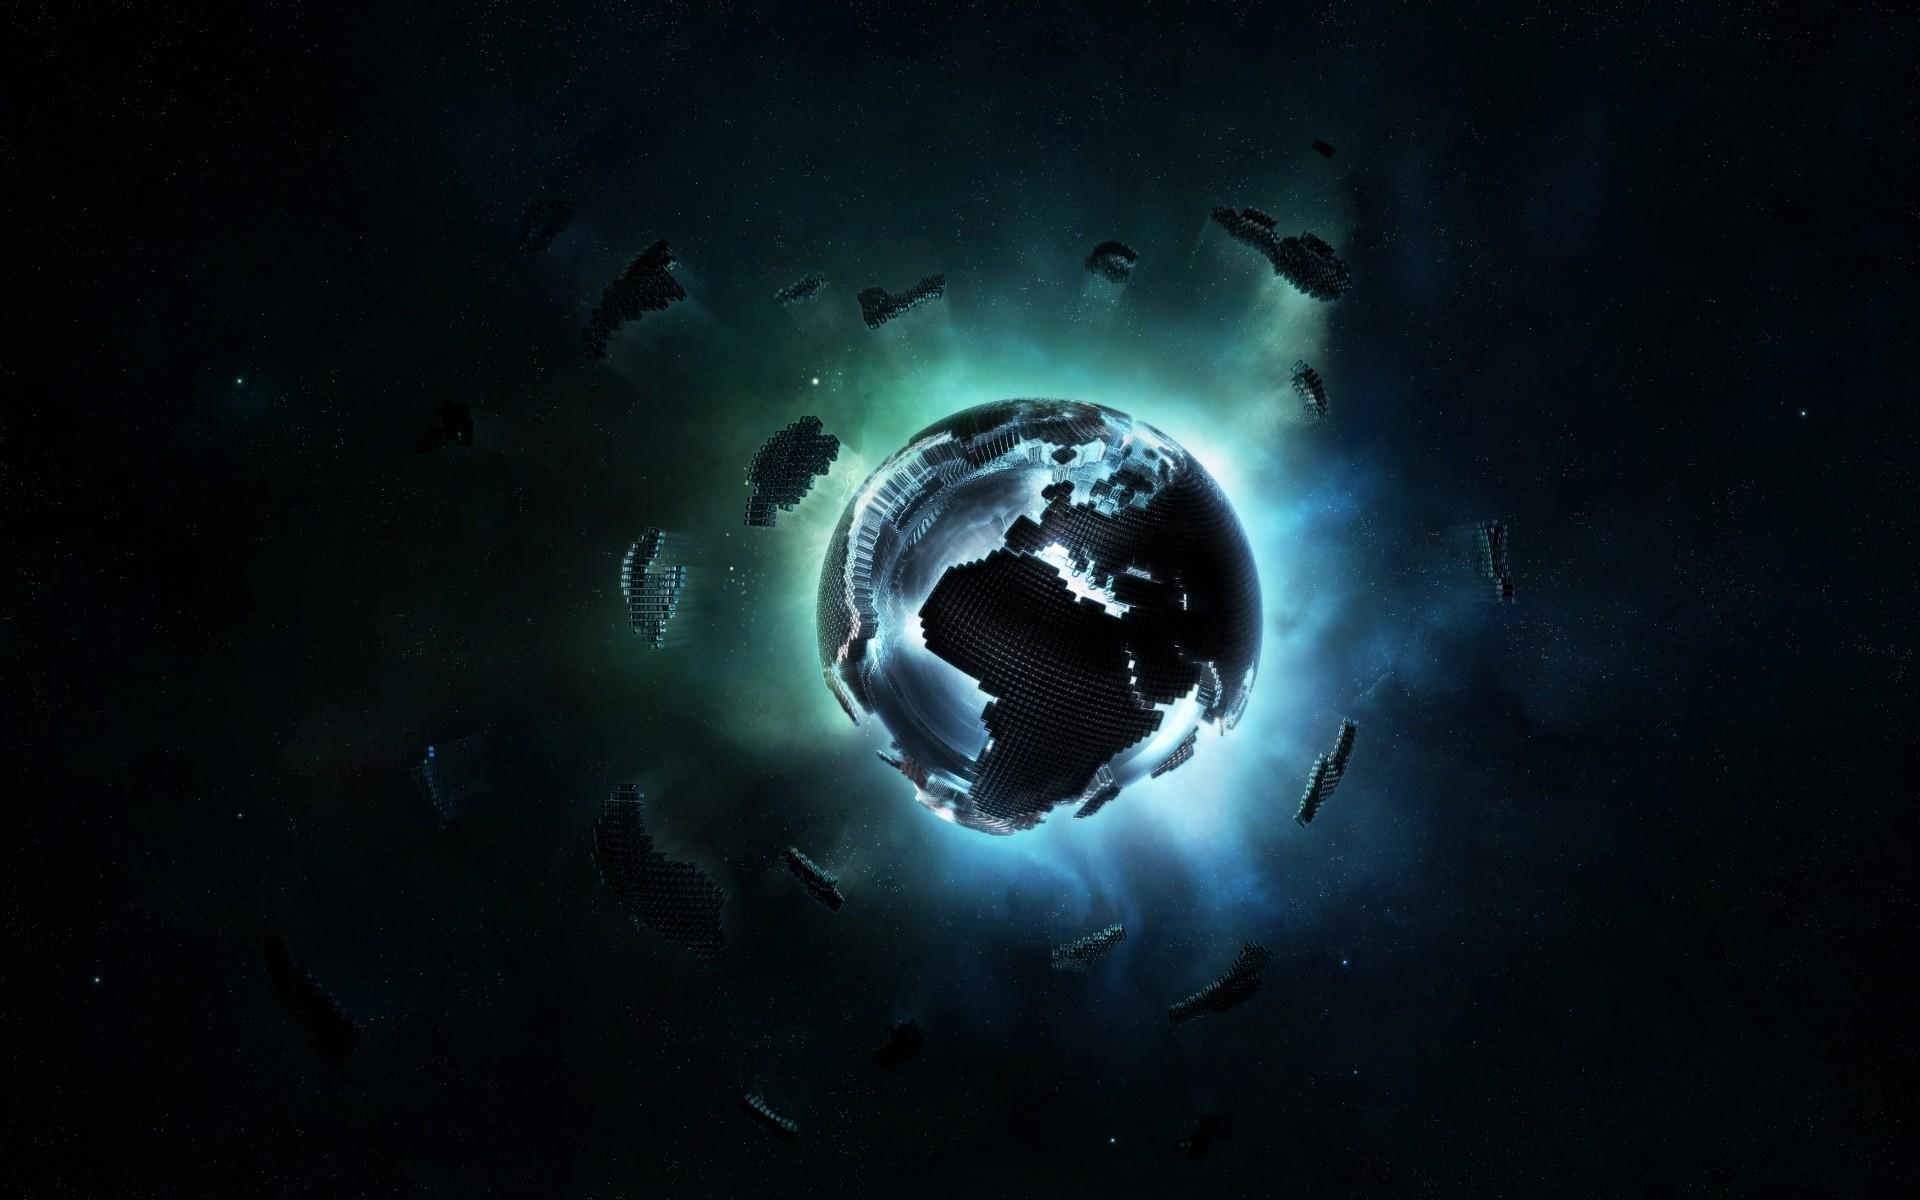 Earth Wallpaper High Resolution Iphone